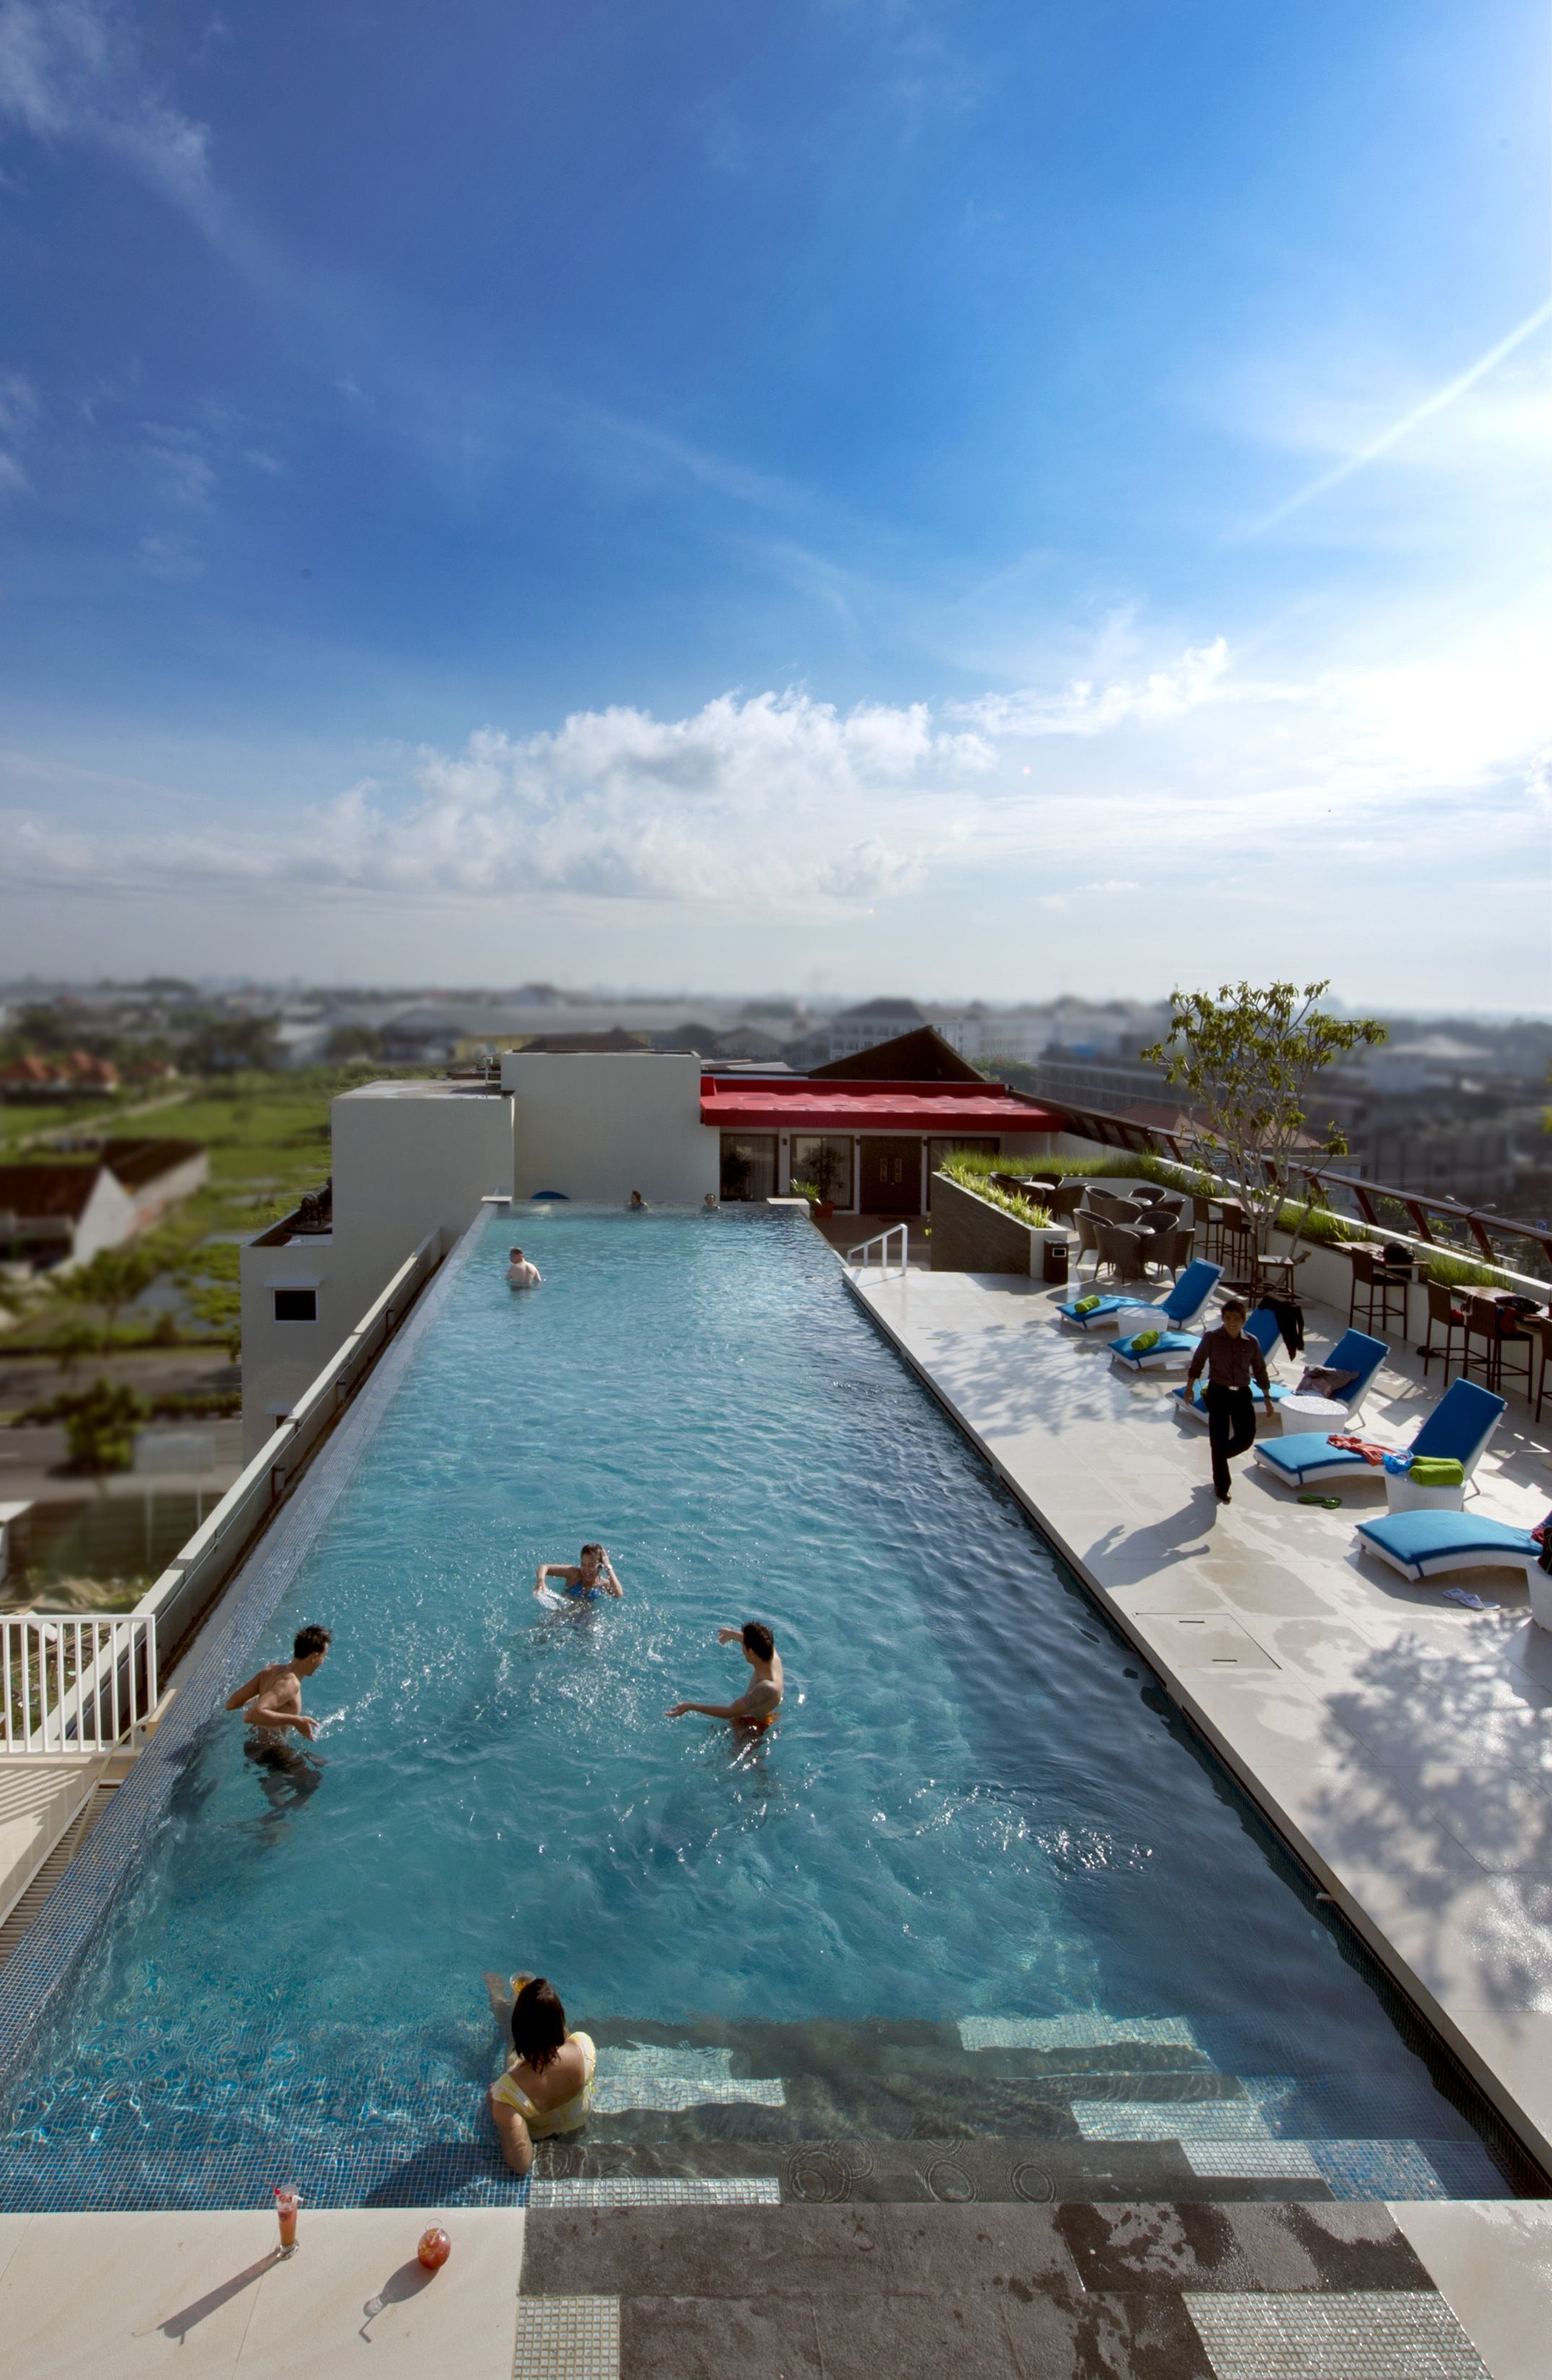 Hotels In Book Promo Hotel Badung Voucer Best Western Resort Kuta Bali Atanaya By Century Park